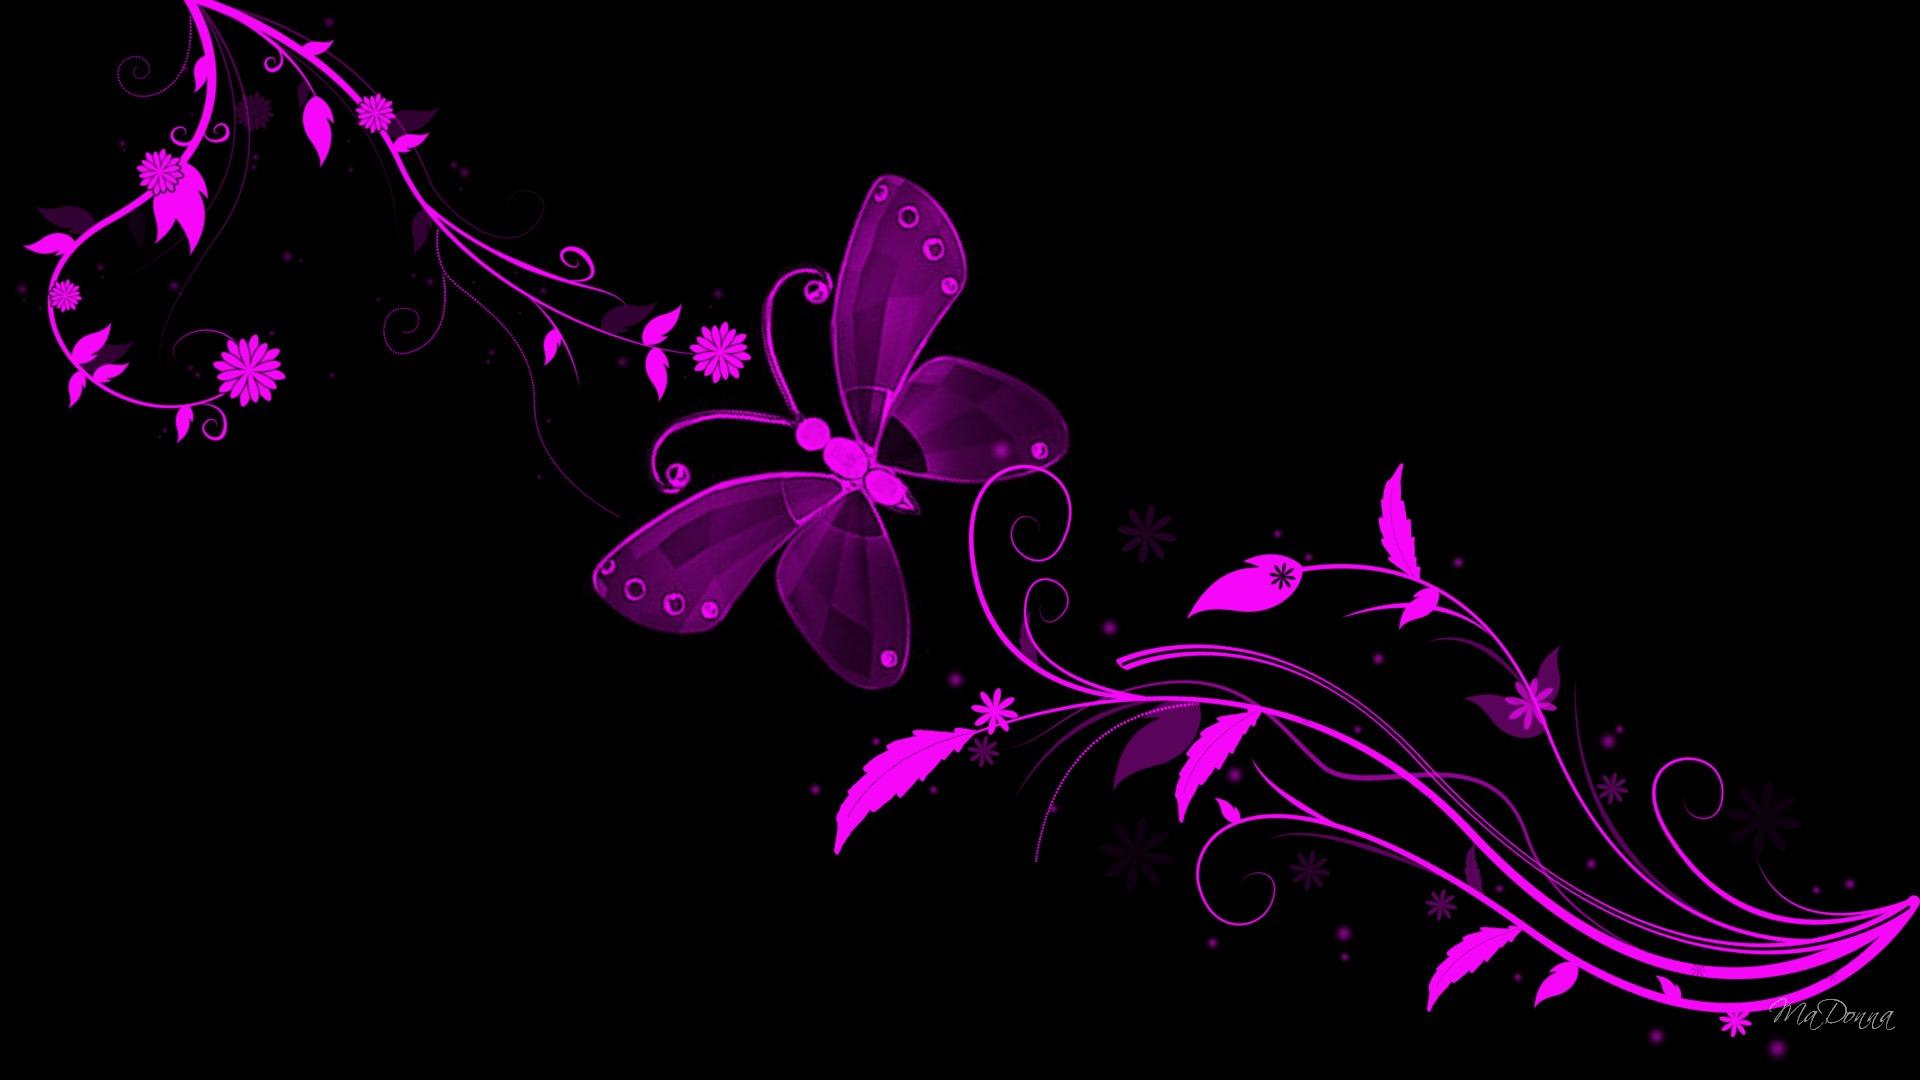 Black purple wallpaper hd abstract 24625 wallpaper 1920x1080